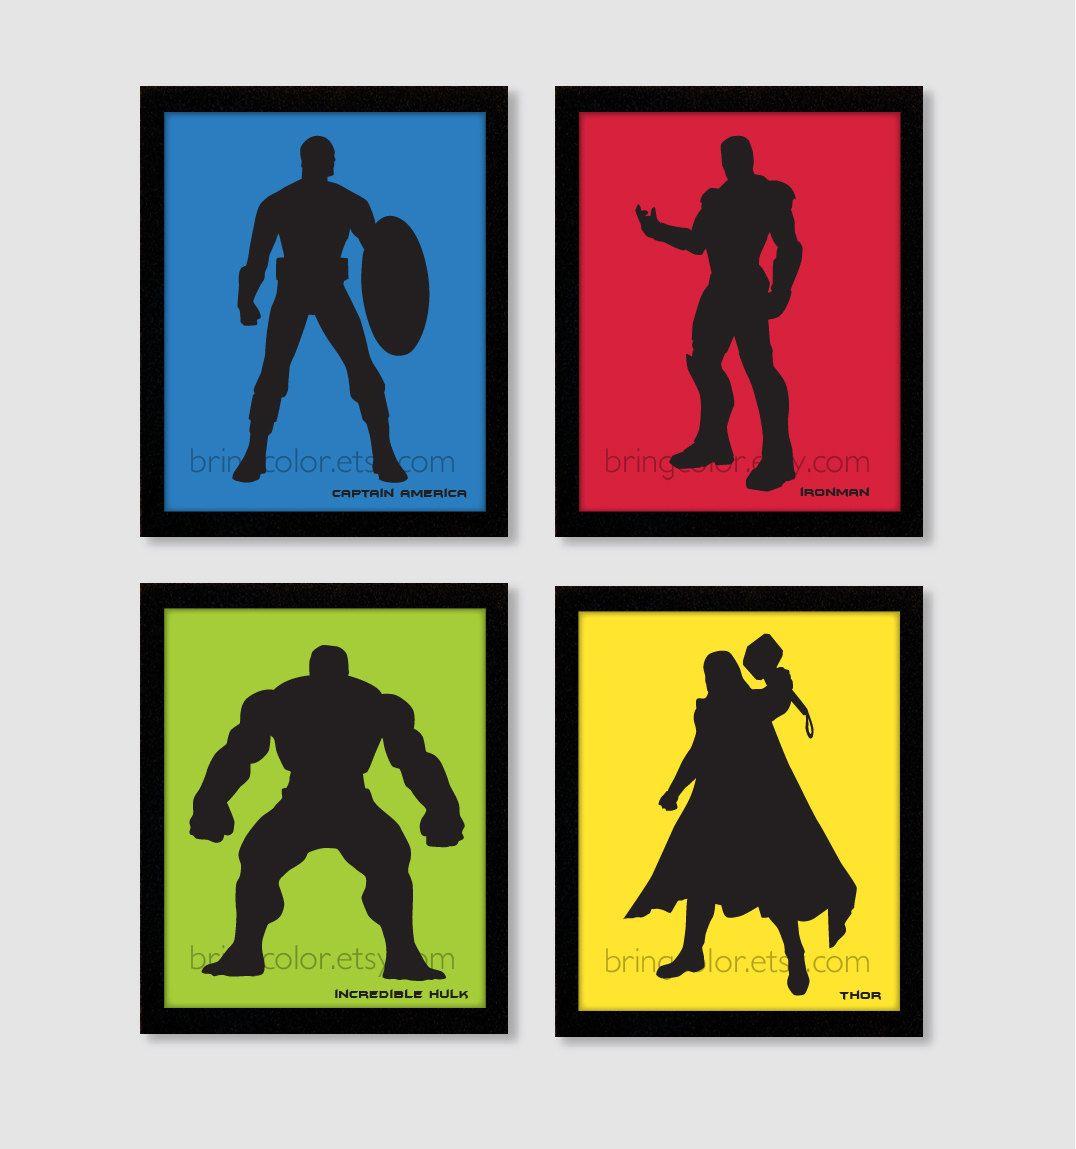 Superheroes Marvel Dc Comics Avengers Justice League Silhouette Set Of 4 Wall Art Prints 8x10 Boys Bedroom Or Home Decor